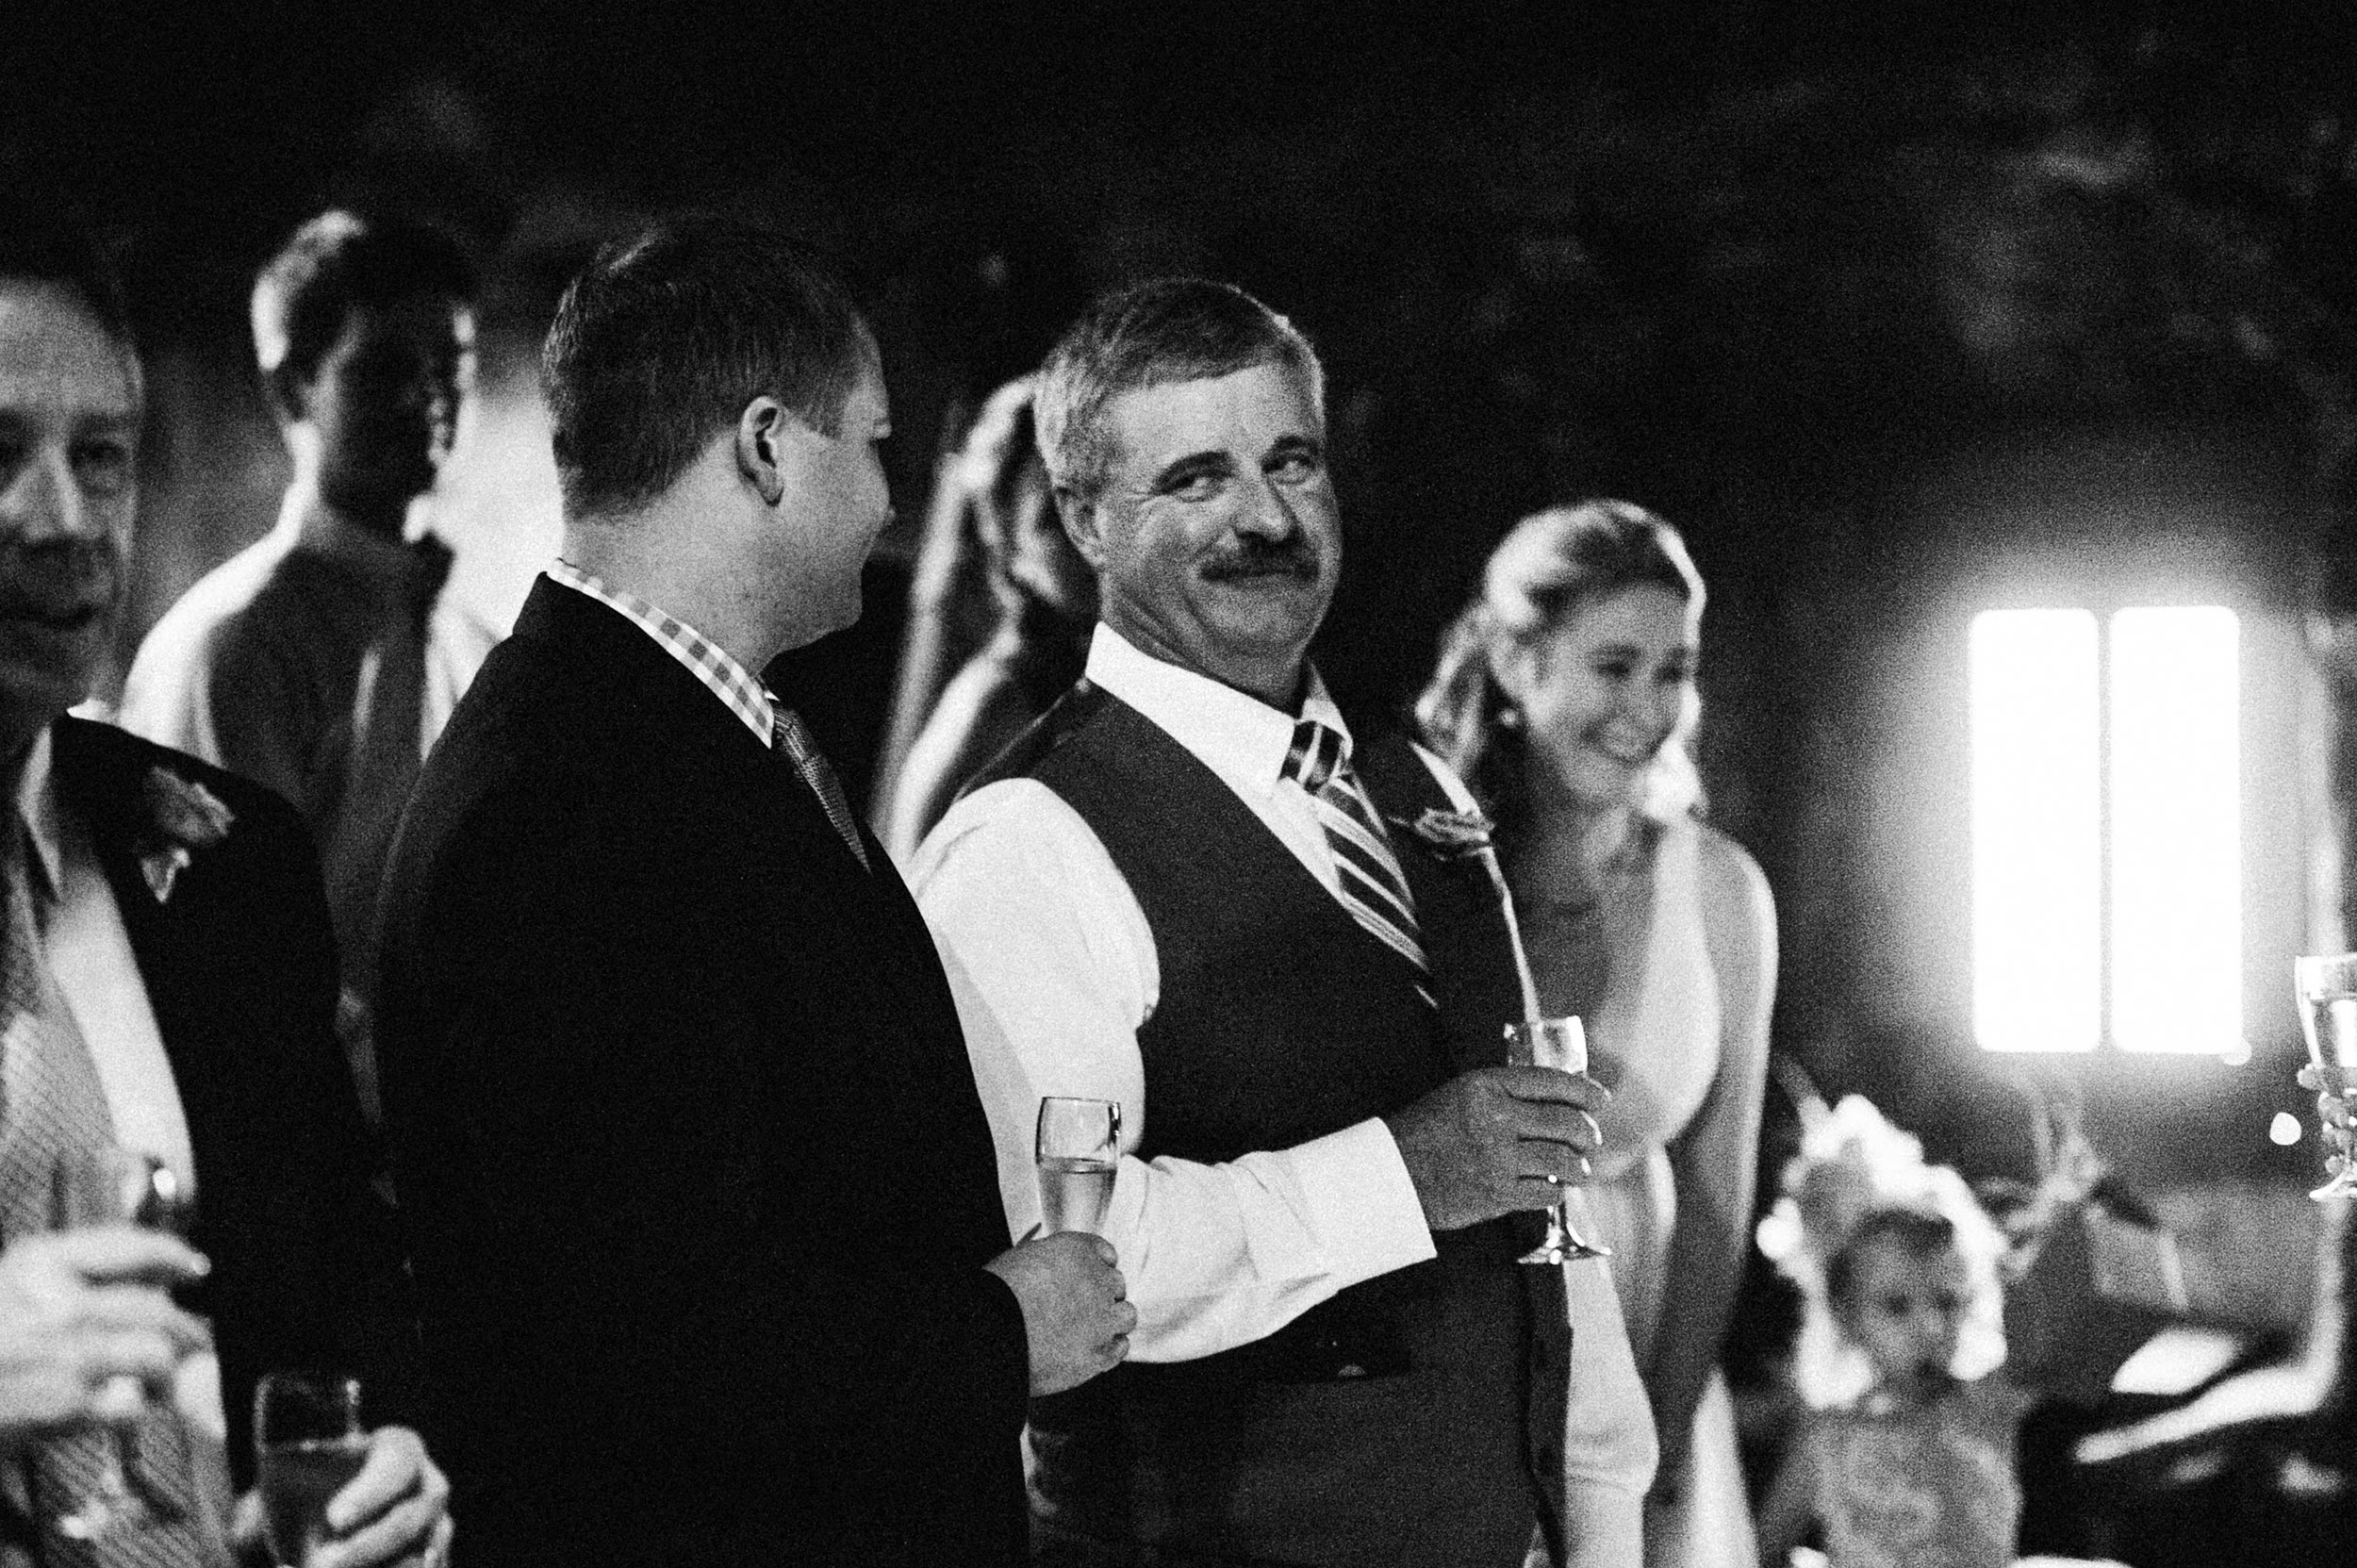 2014-Shelby-Jocelyn-Santo-Stefano-Di-Sessanio-Wedding-Photographer-Italy-Alessandro-Avenali-32.jpg